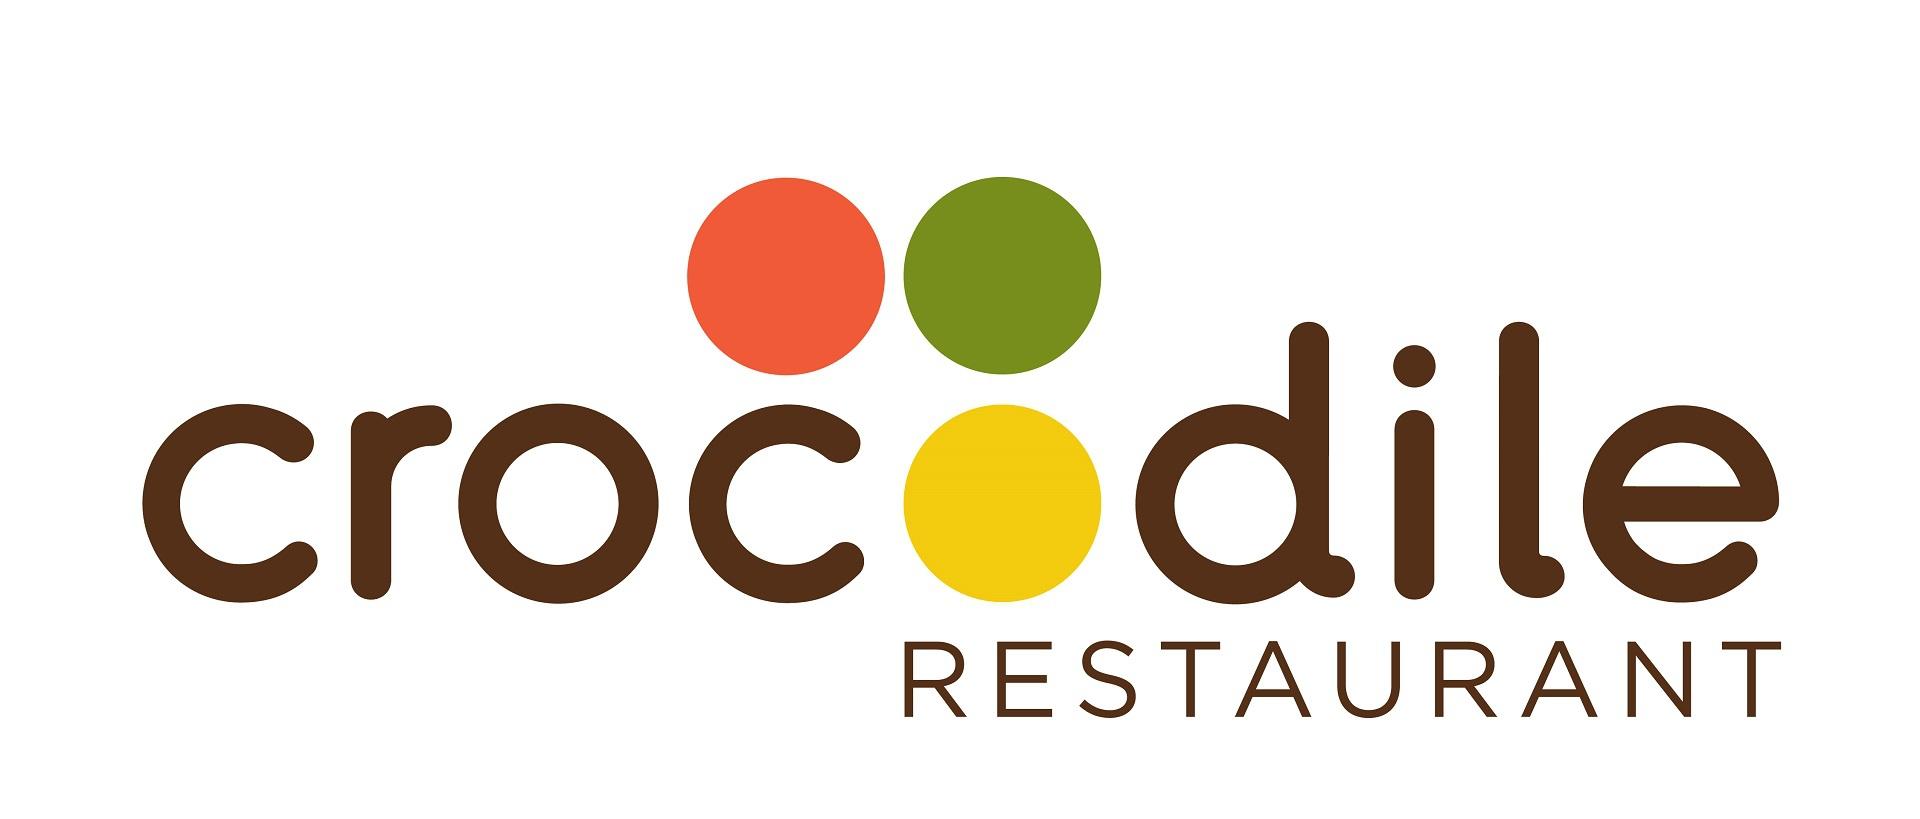 Crocodile Restaurant St Martin Boulogne